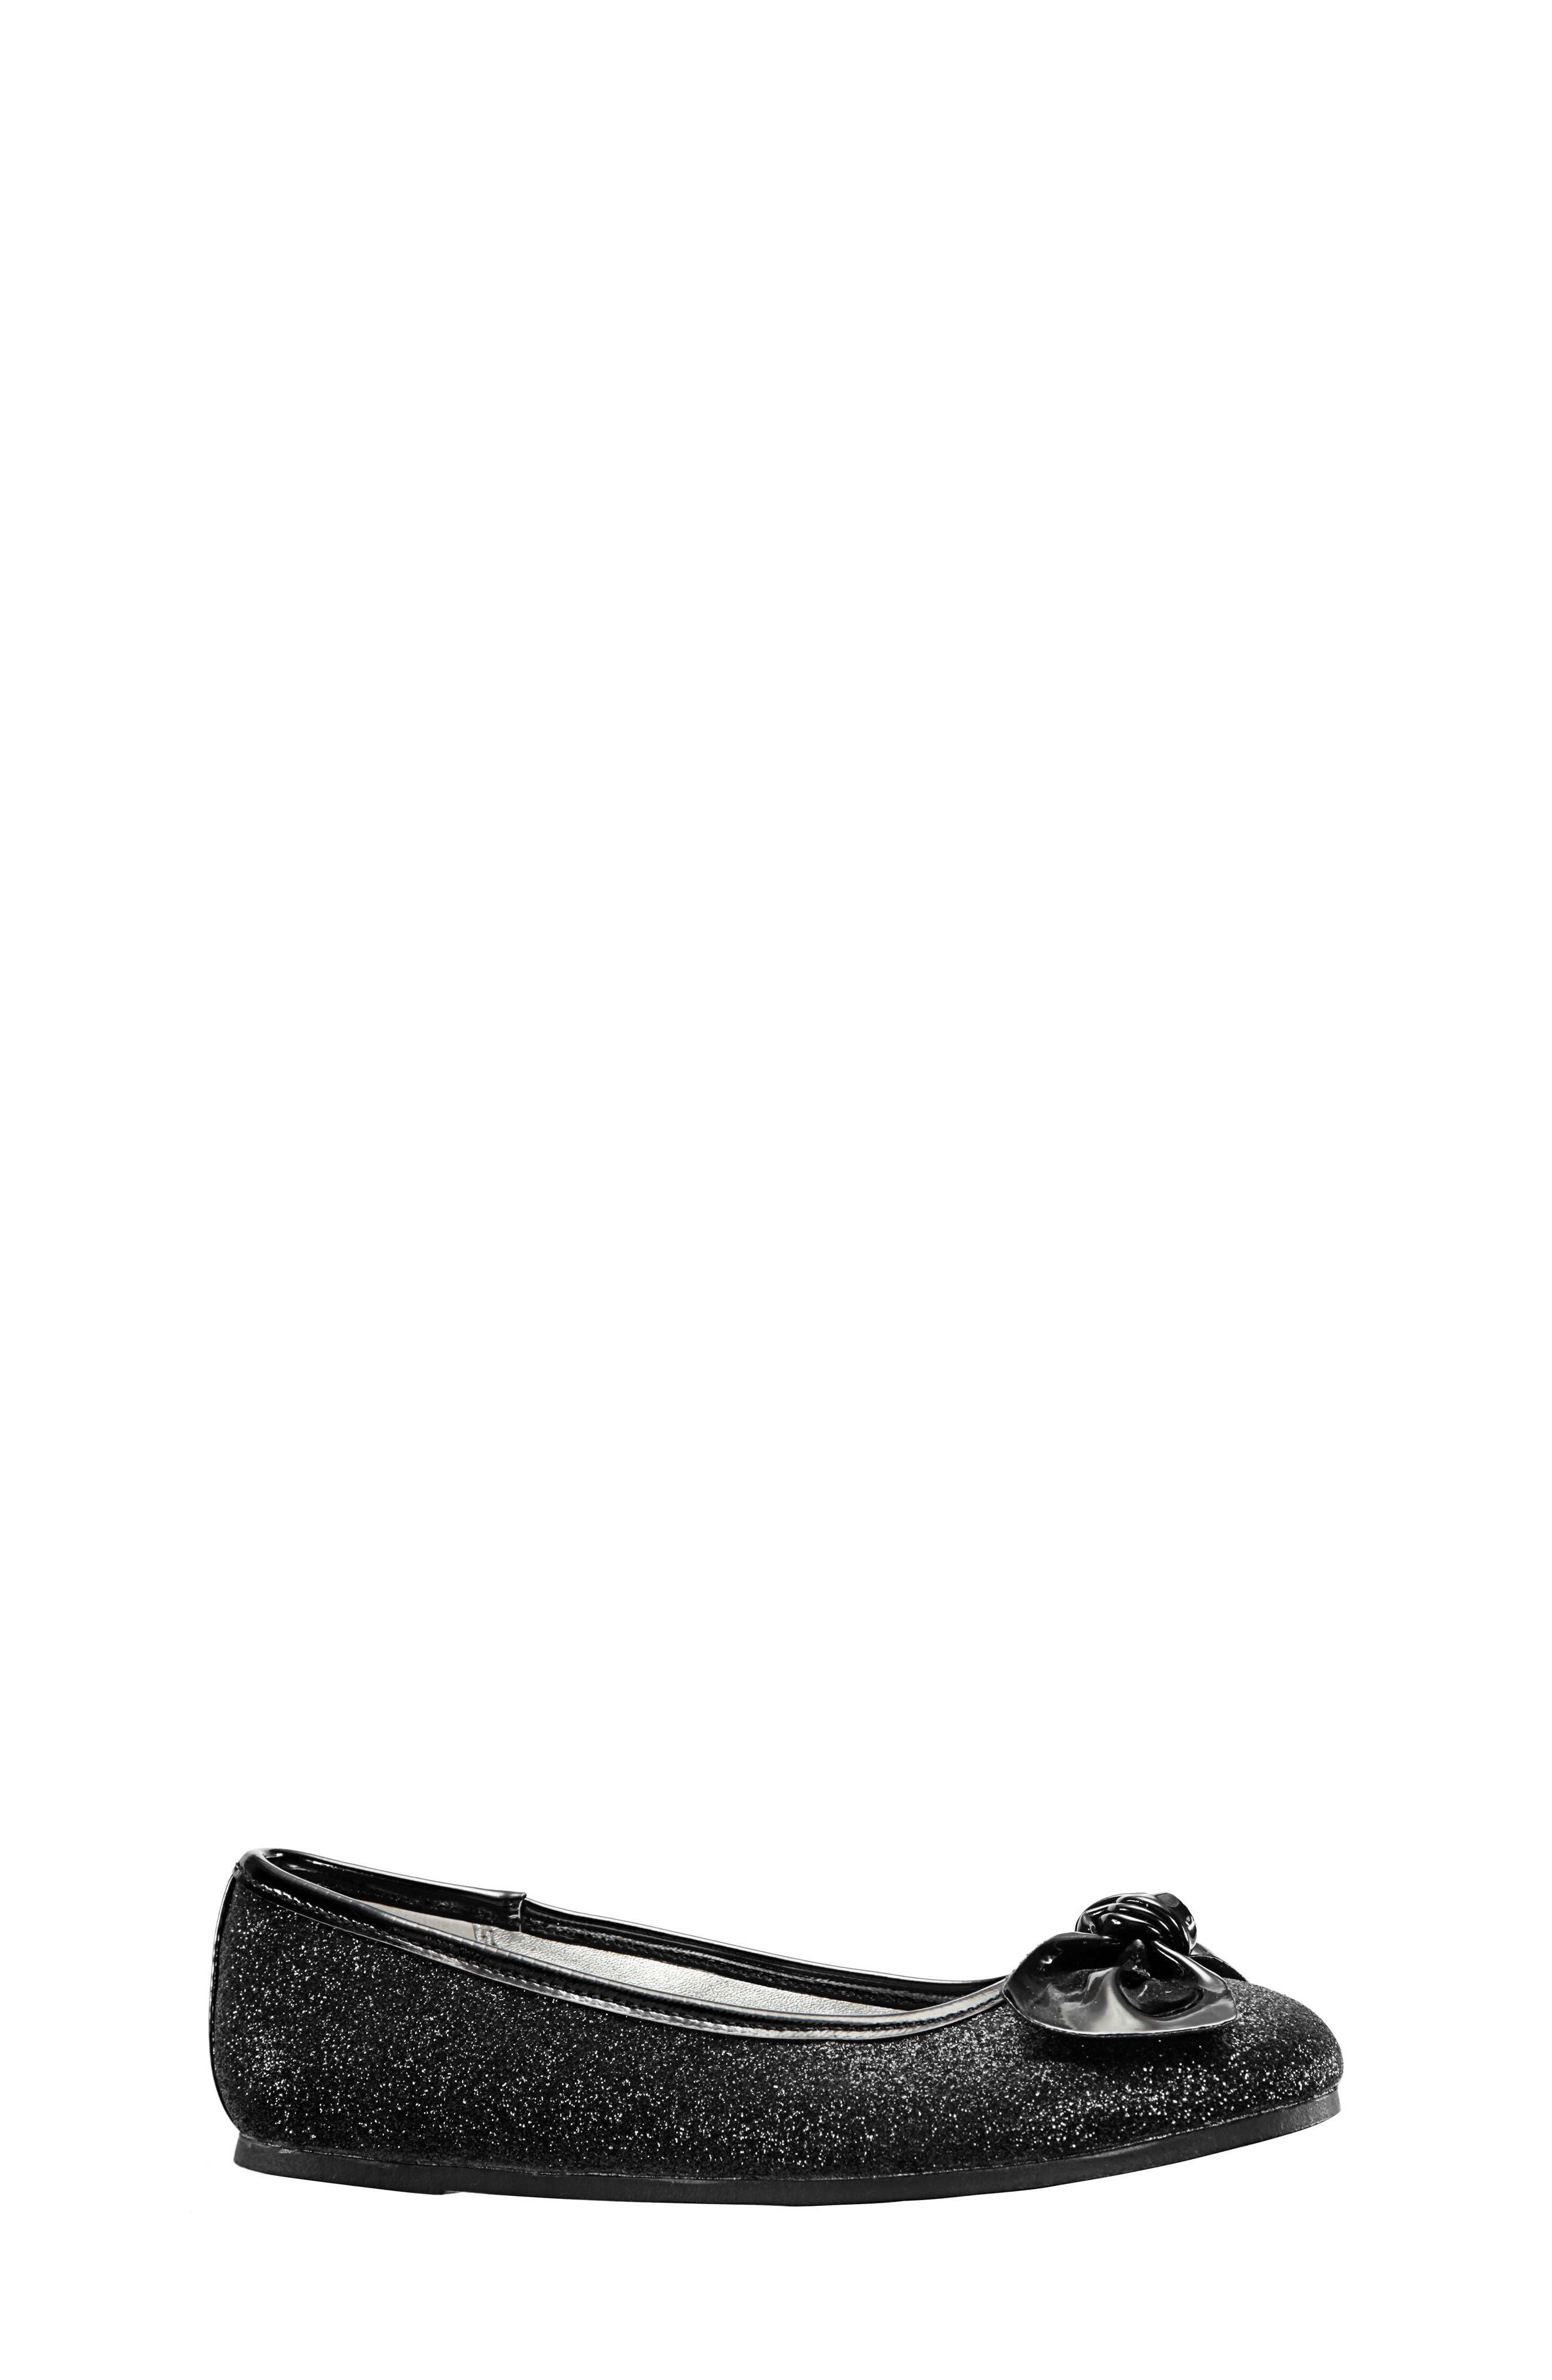 Girls Nina Larabeth Glitter Ballet Flat Size 5 M  Black